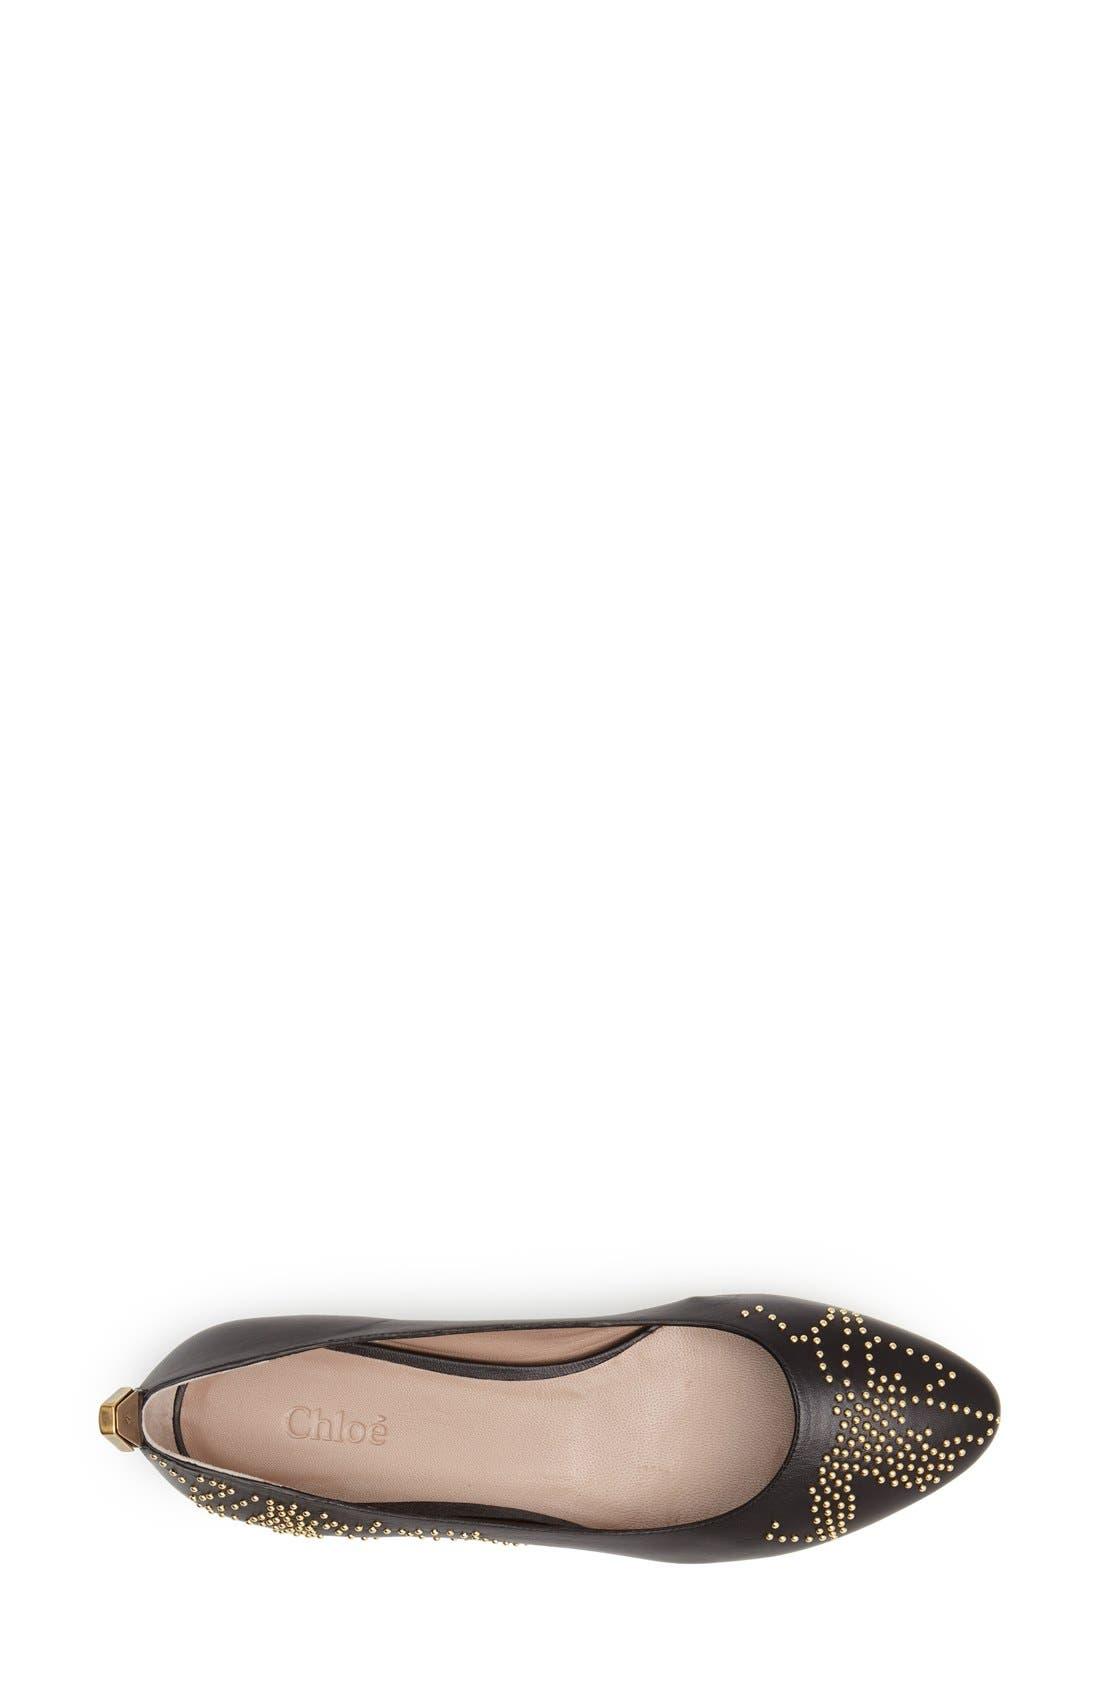 Alternate Image 3  - Chloé 'Suzanna' Ballerina Flat (Women)